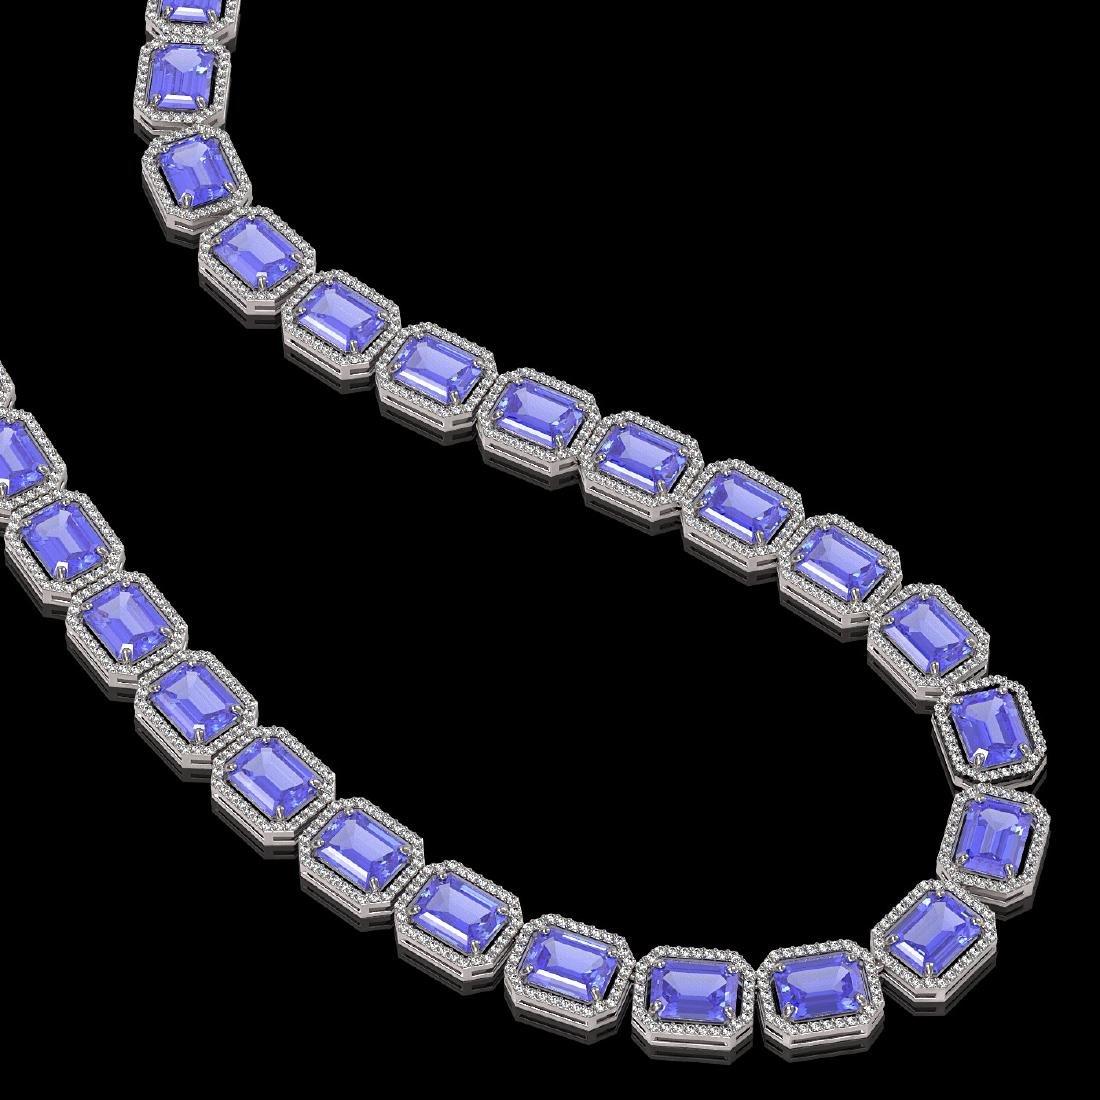 79.99 CTW Tanzanite & Diamond Halo Necklace 10K White - 2